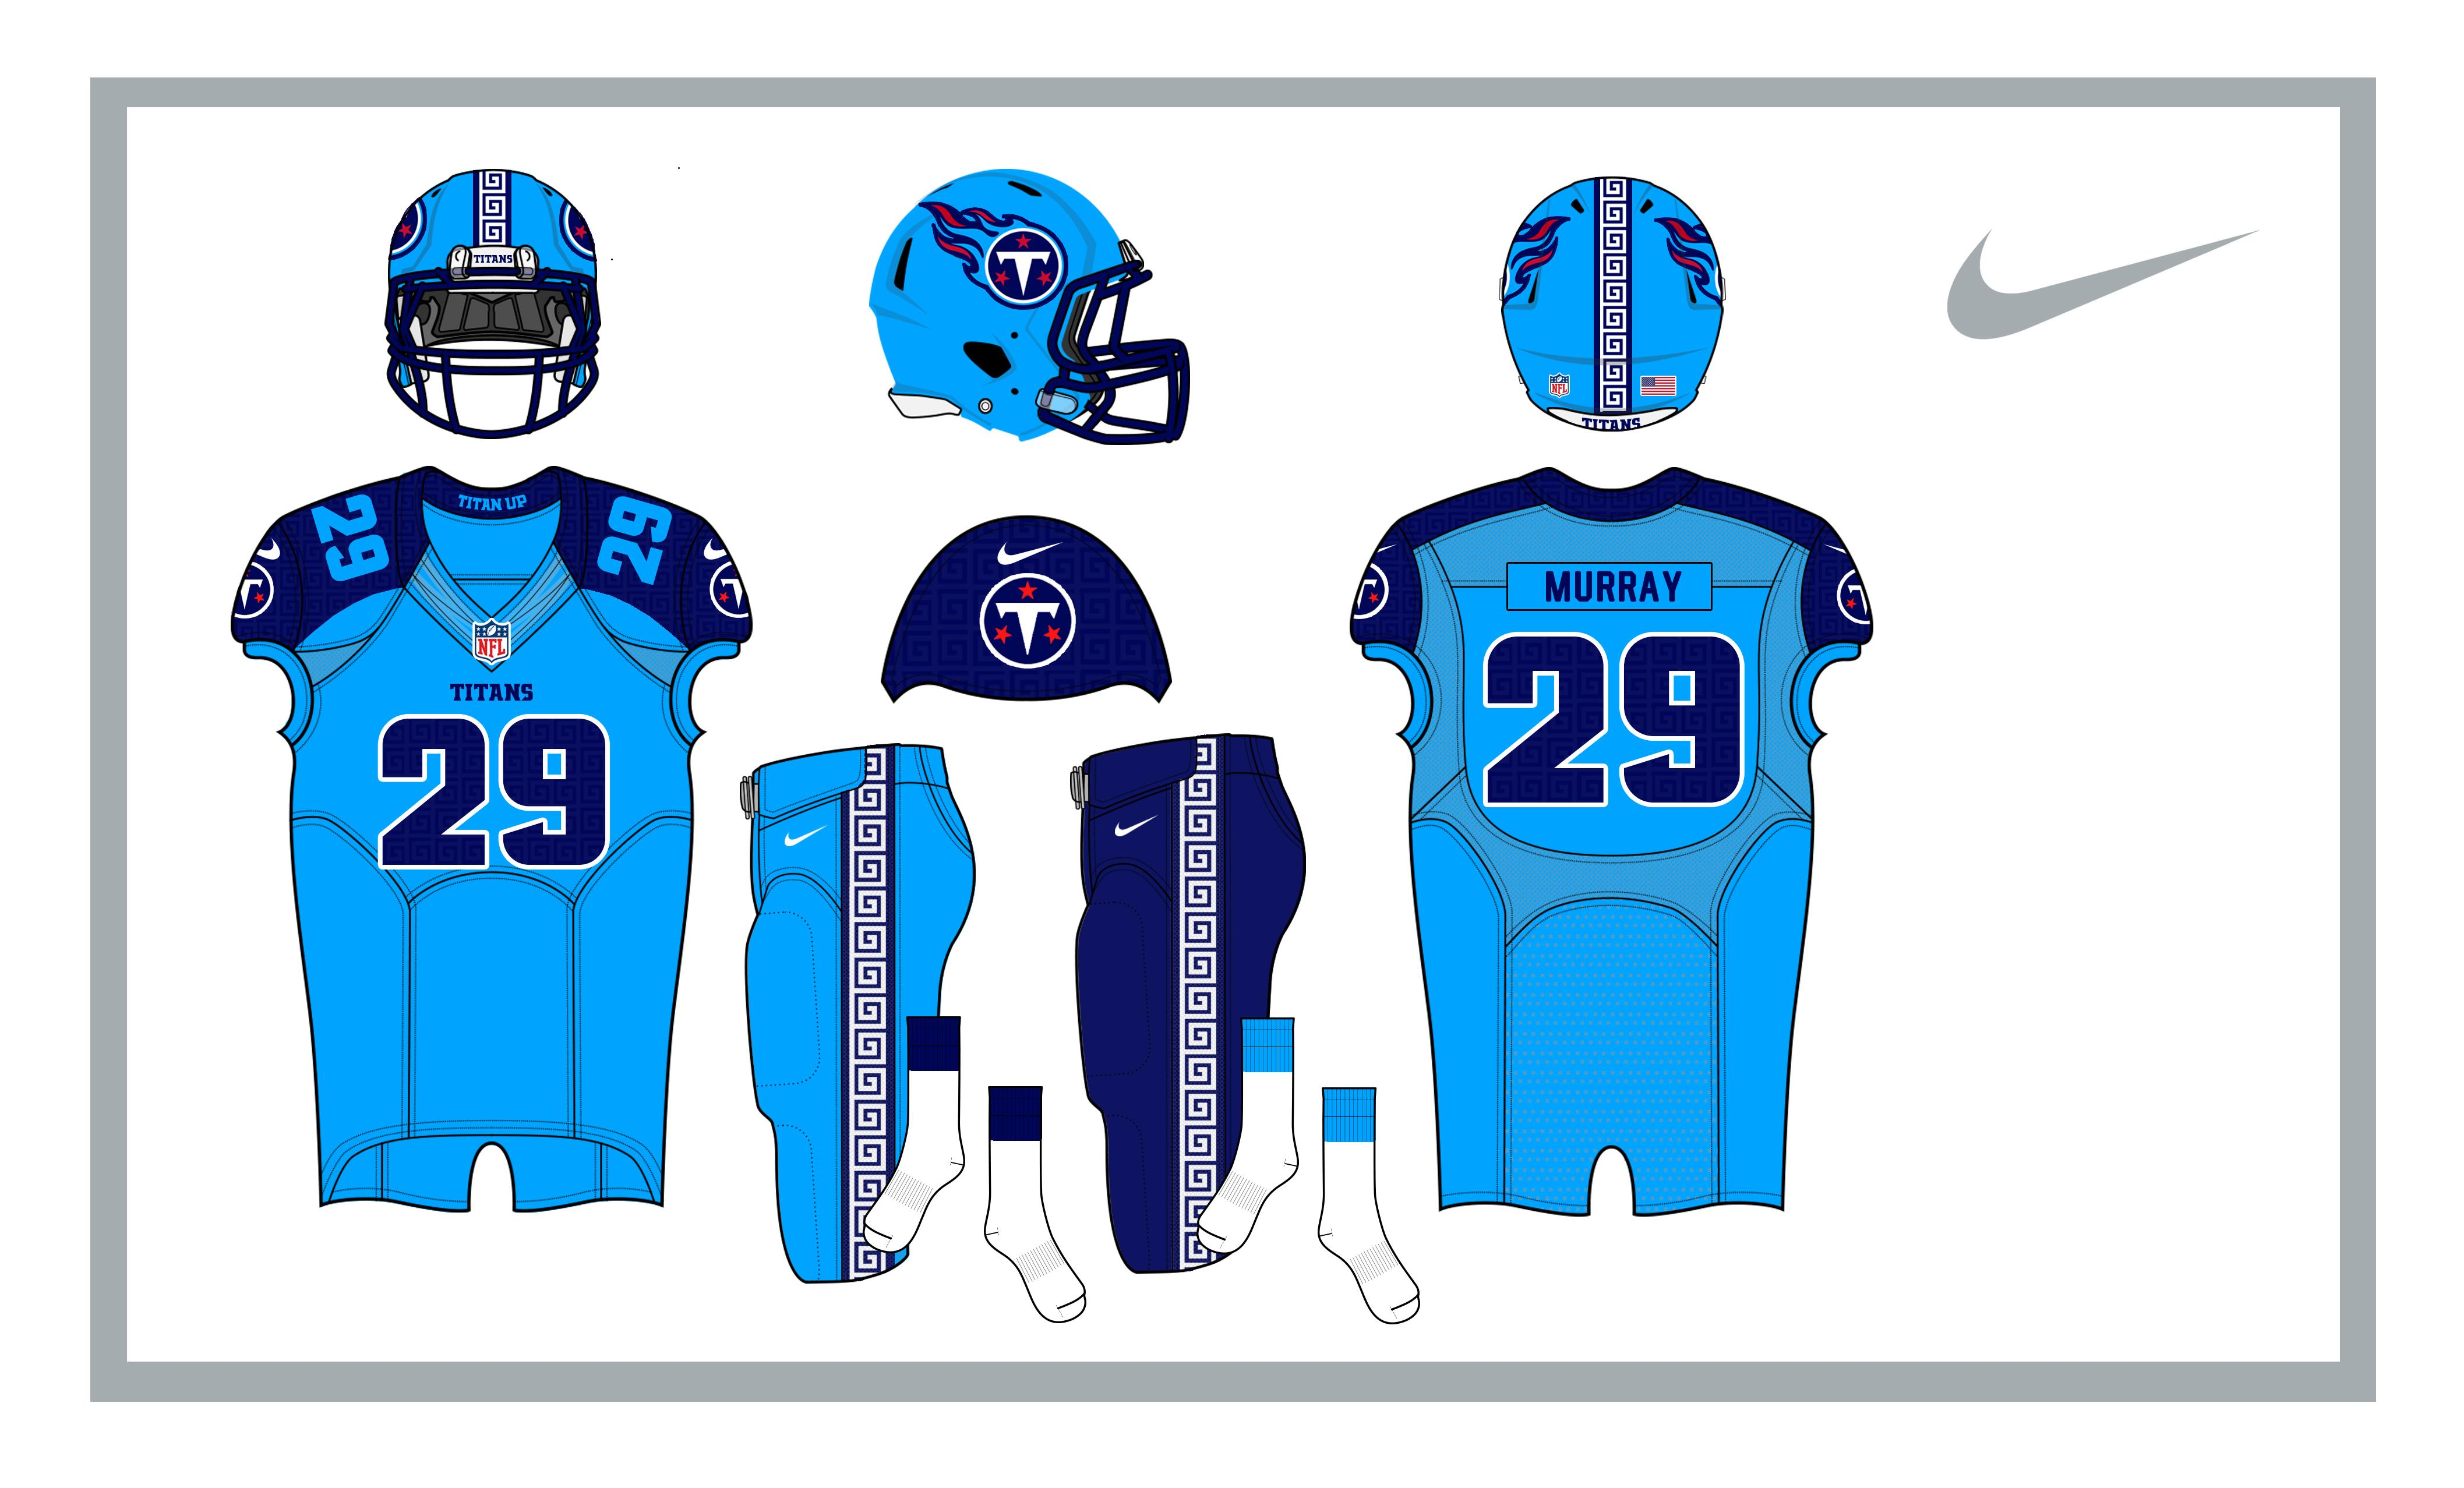 Nike titans concept uniforms color rush throwback jpg 4230x2555 Titans  throwback jersey 64f4c73d0